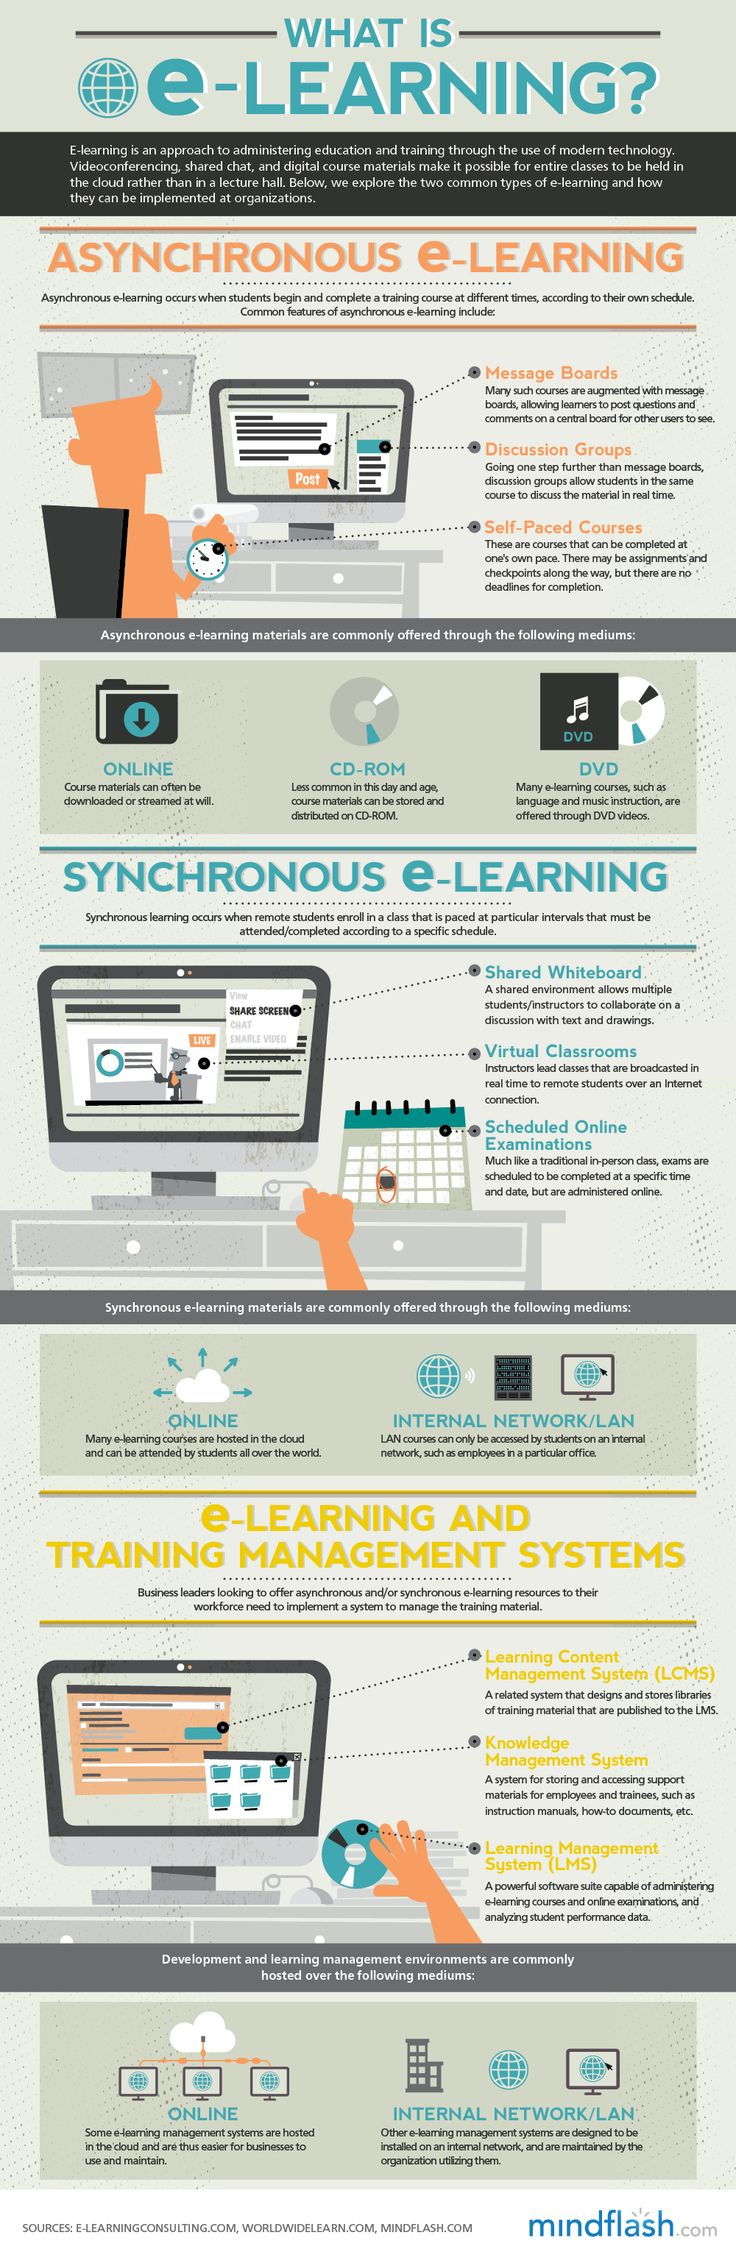 ¿Qué es el e-learning? #infografia #infographic #education